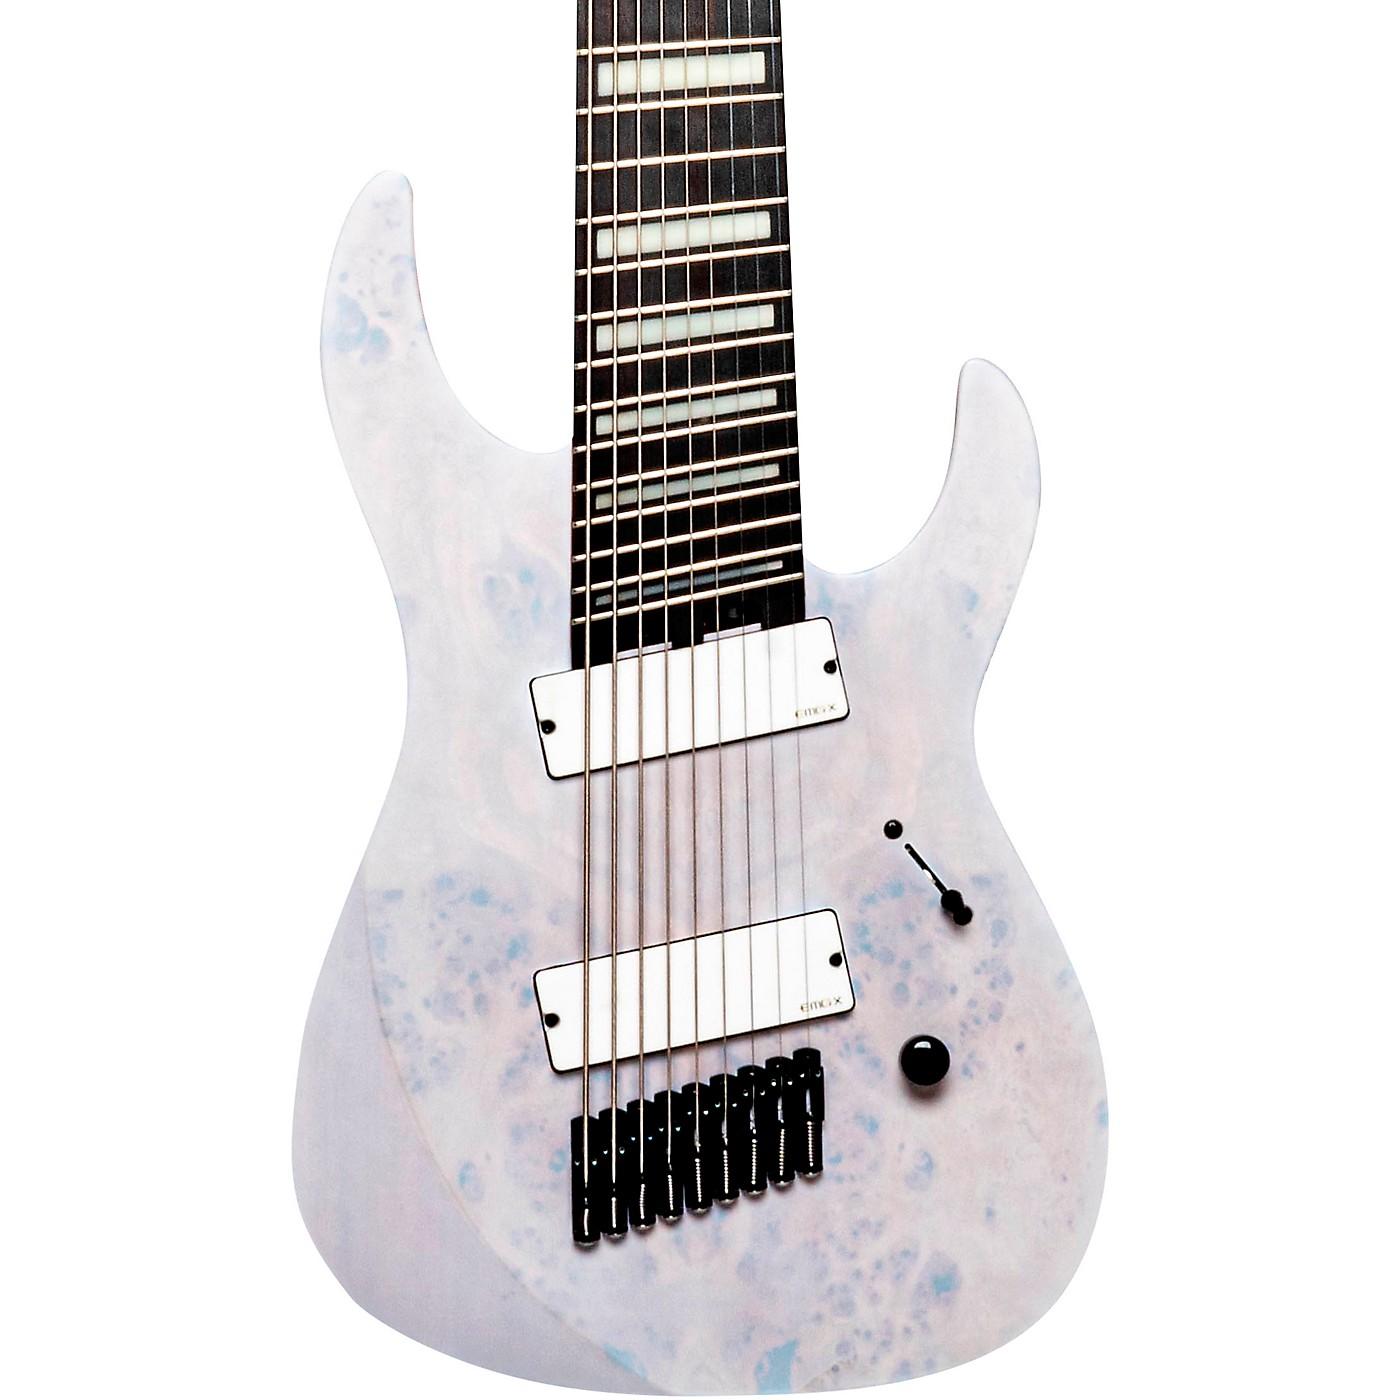 Legator LM-9 Lucas Mann Ninja 9-string Multi-Scale Signature Electric Guitar thumbnail